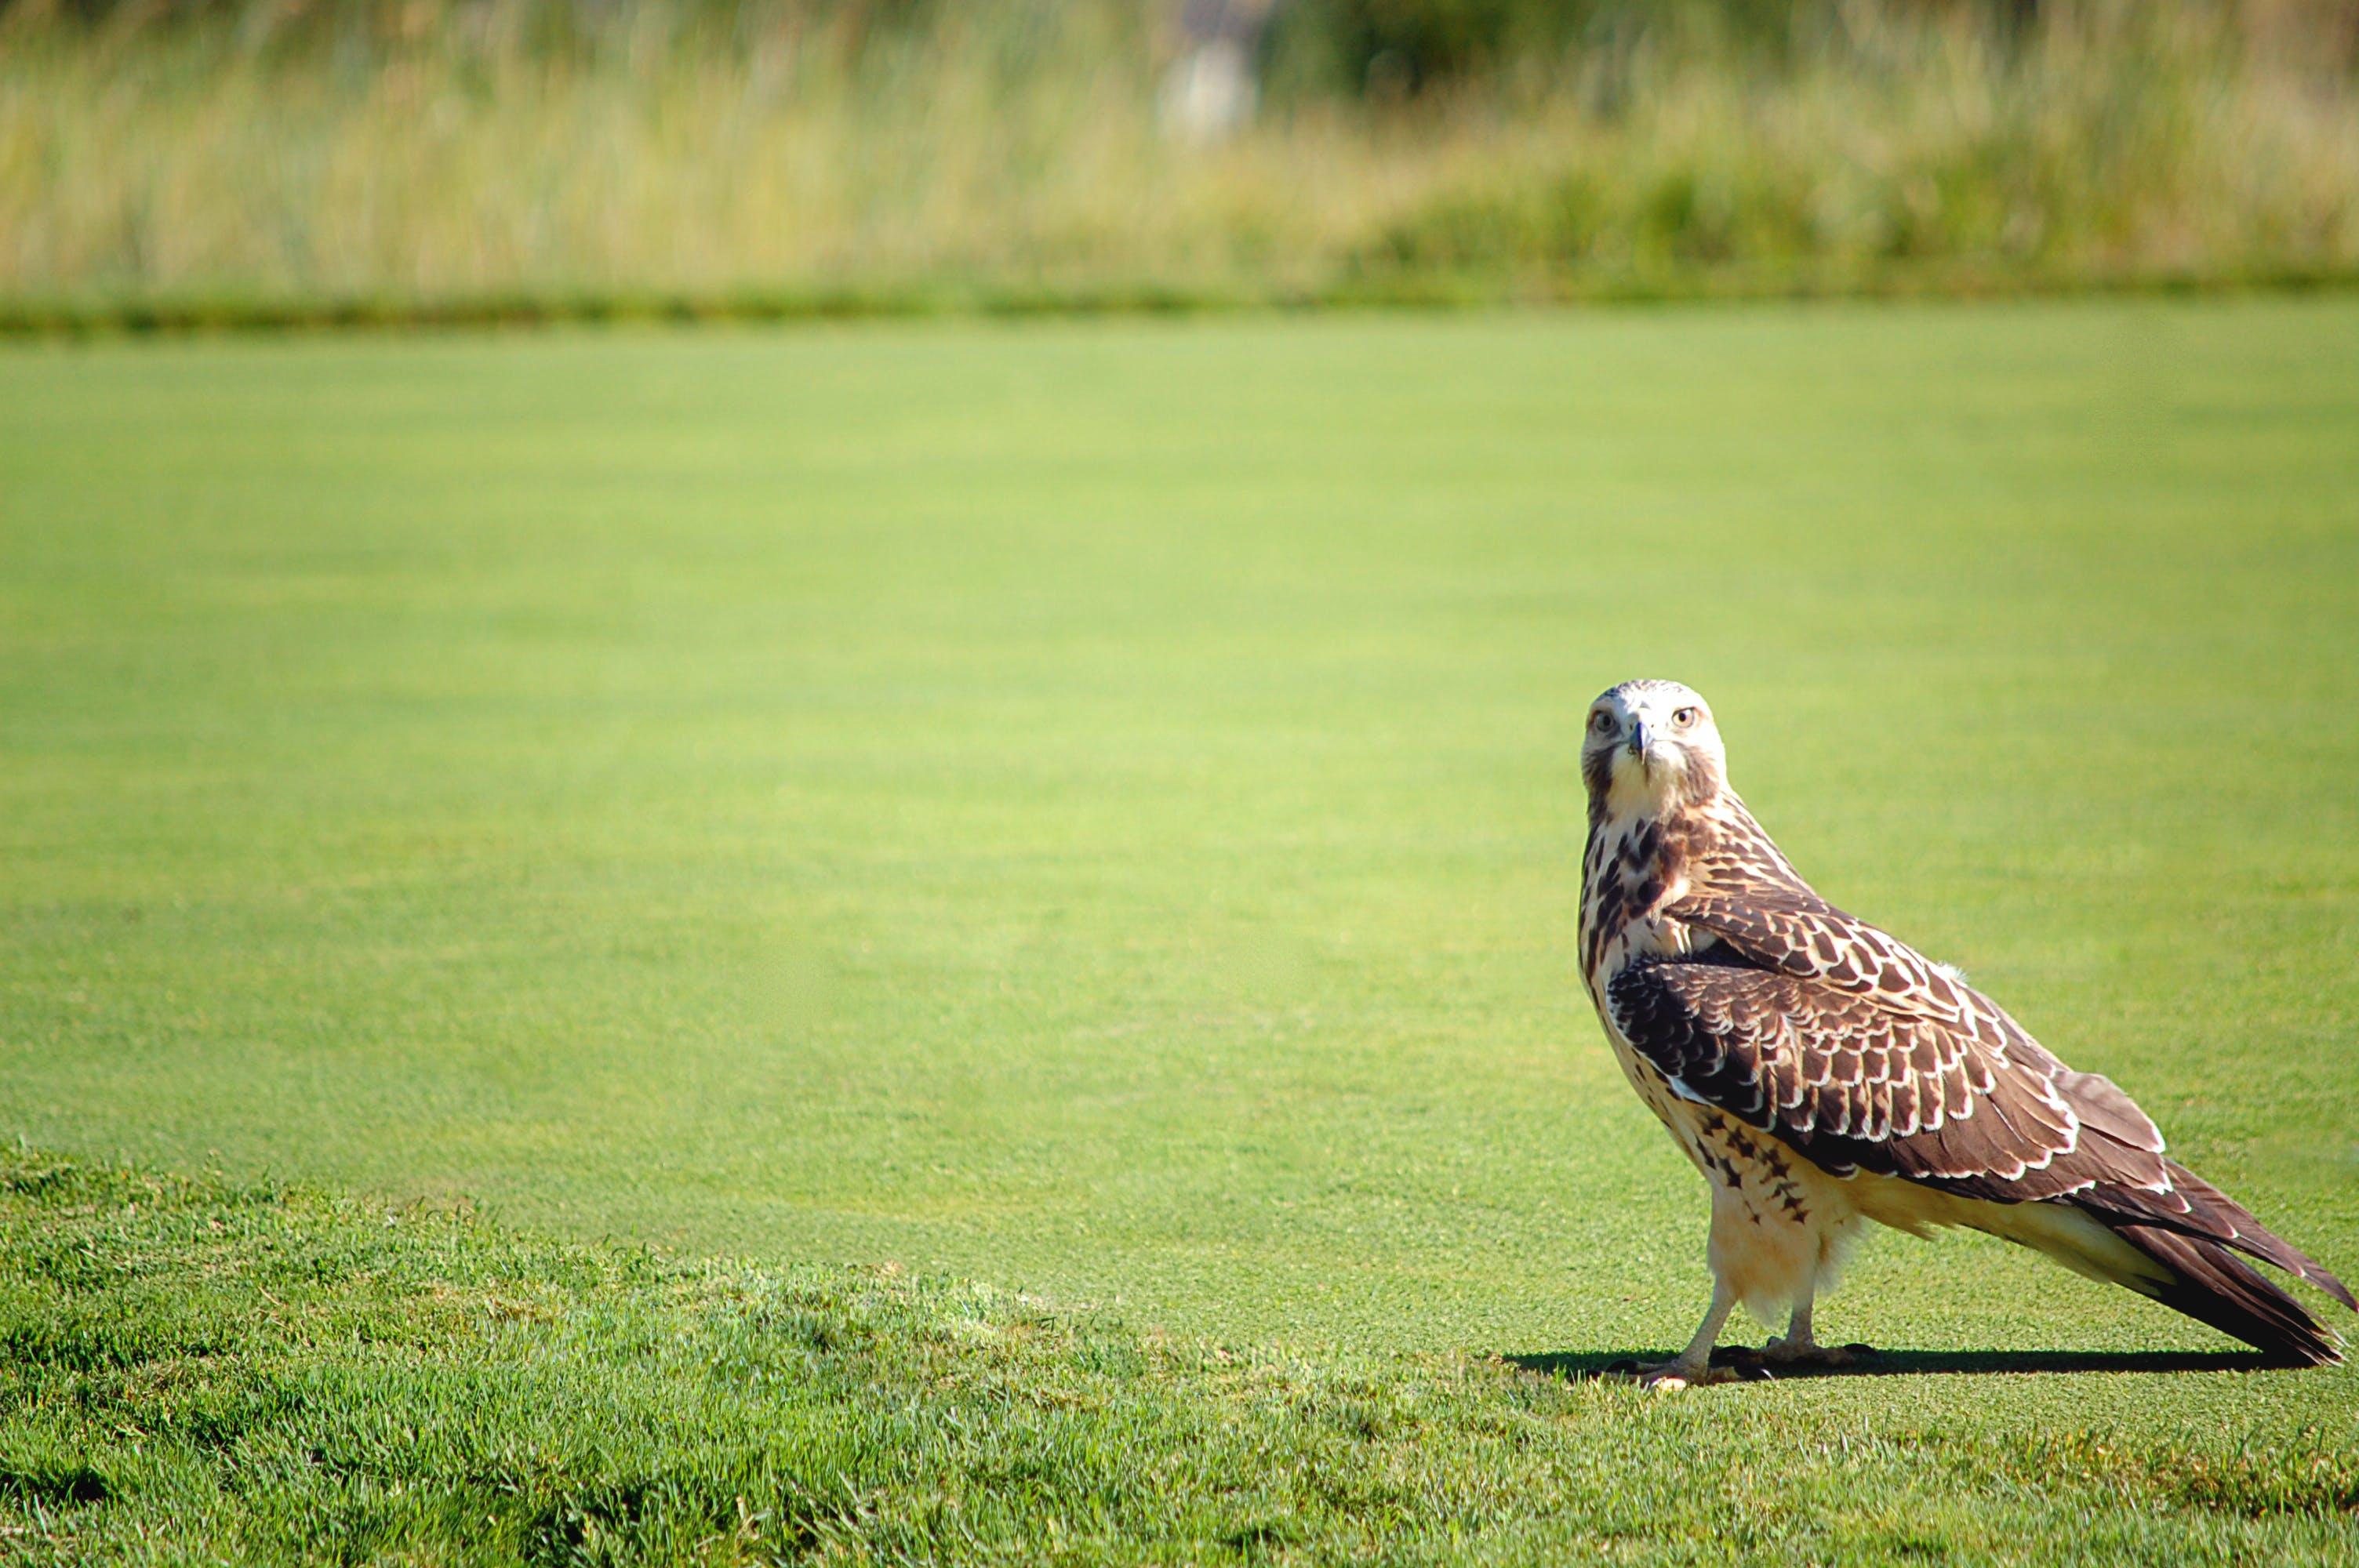 Kostenloses Stock Foto zu falke, gras, natur, raubvogel